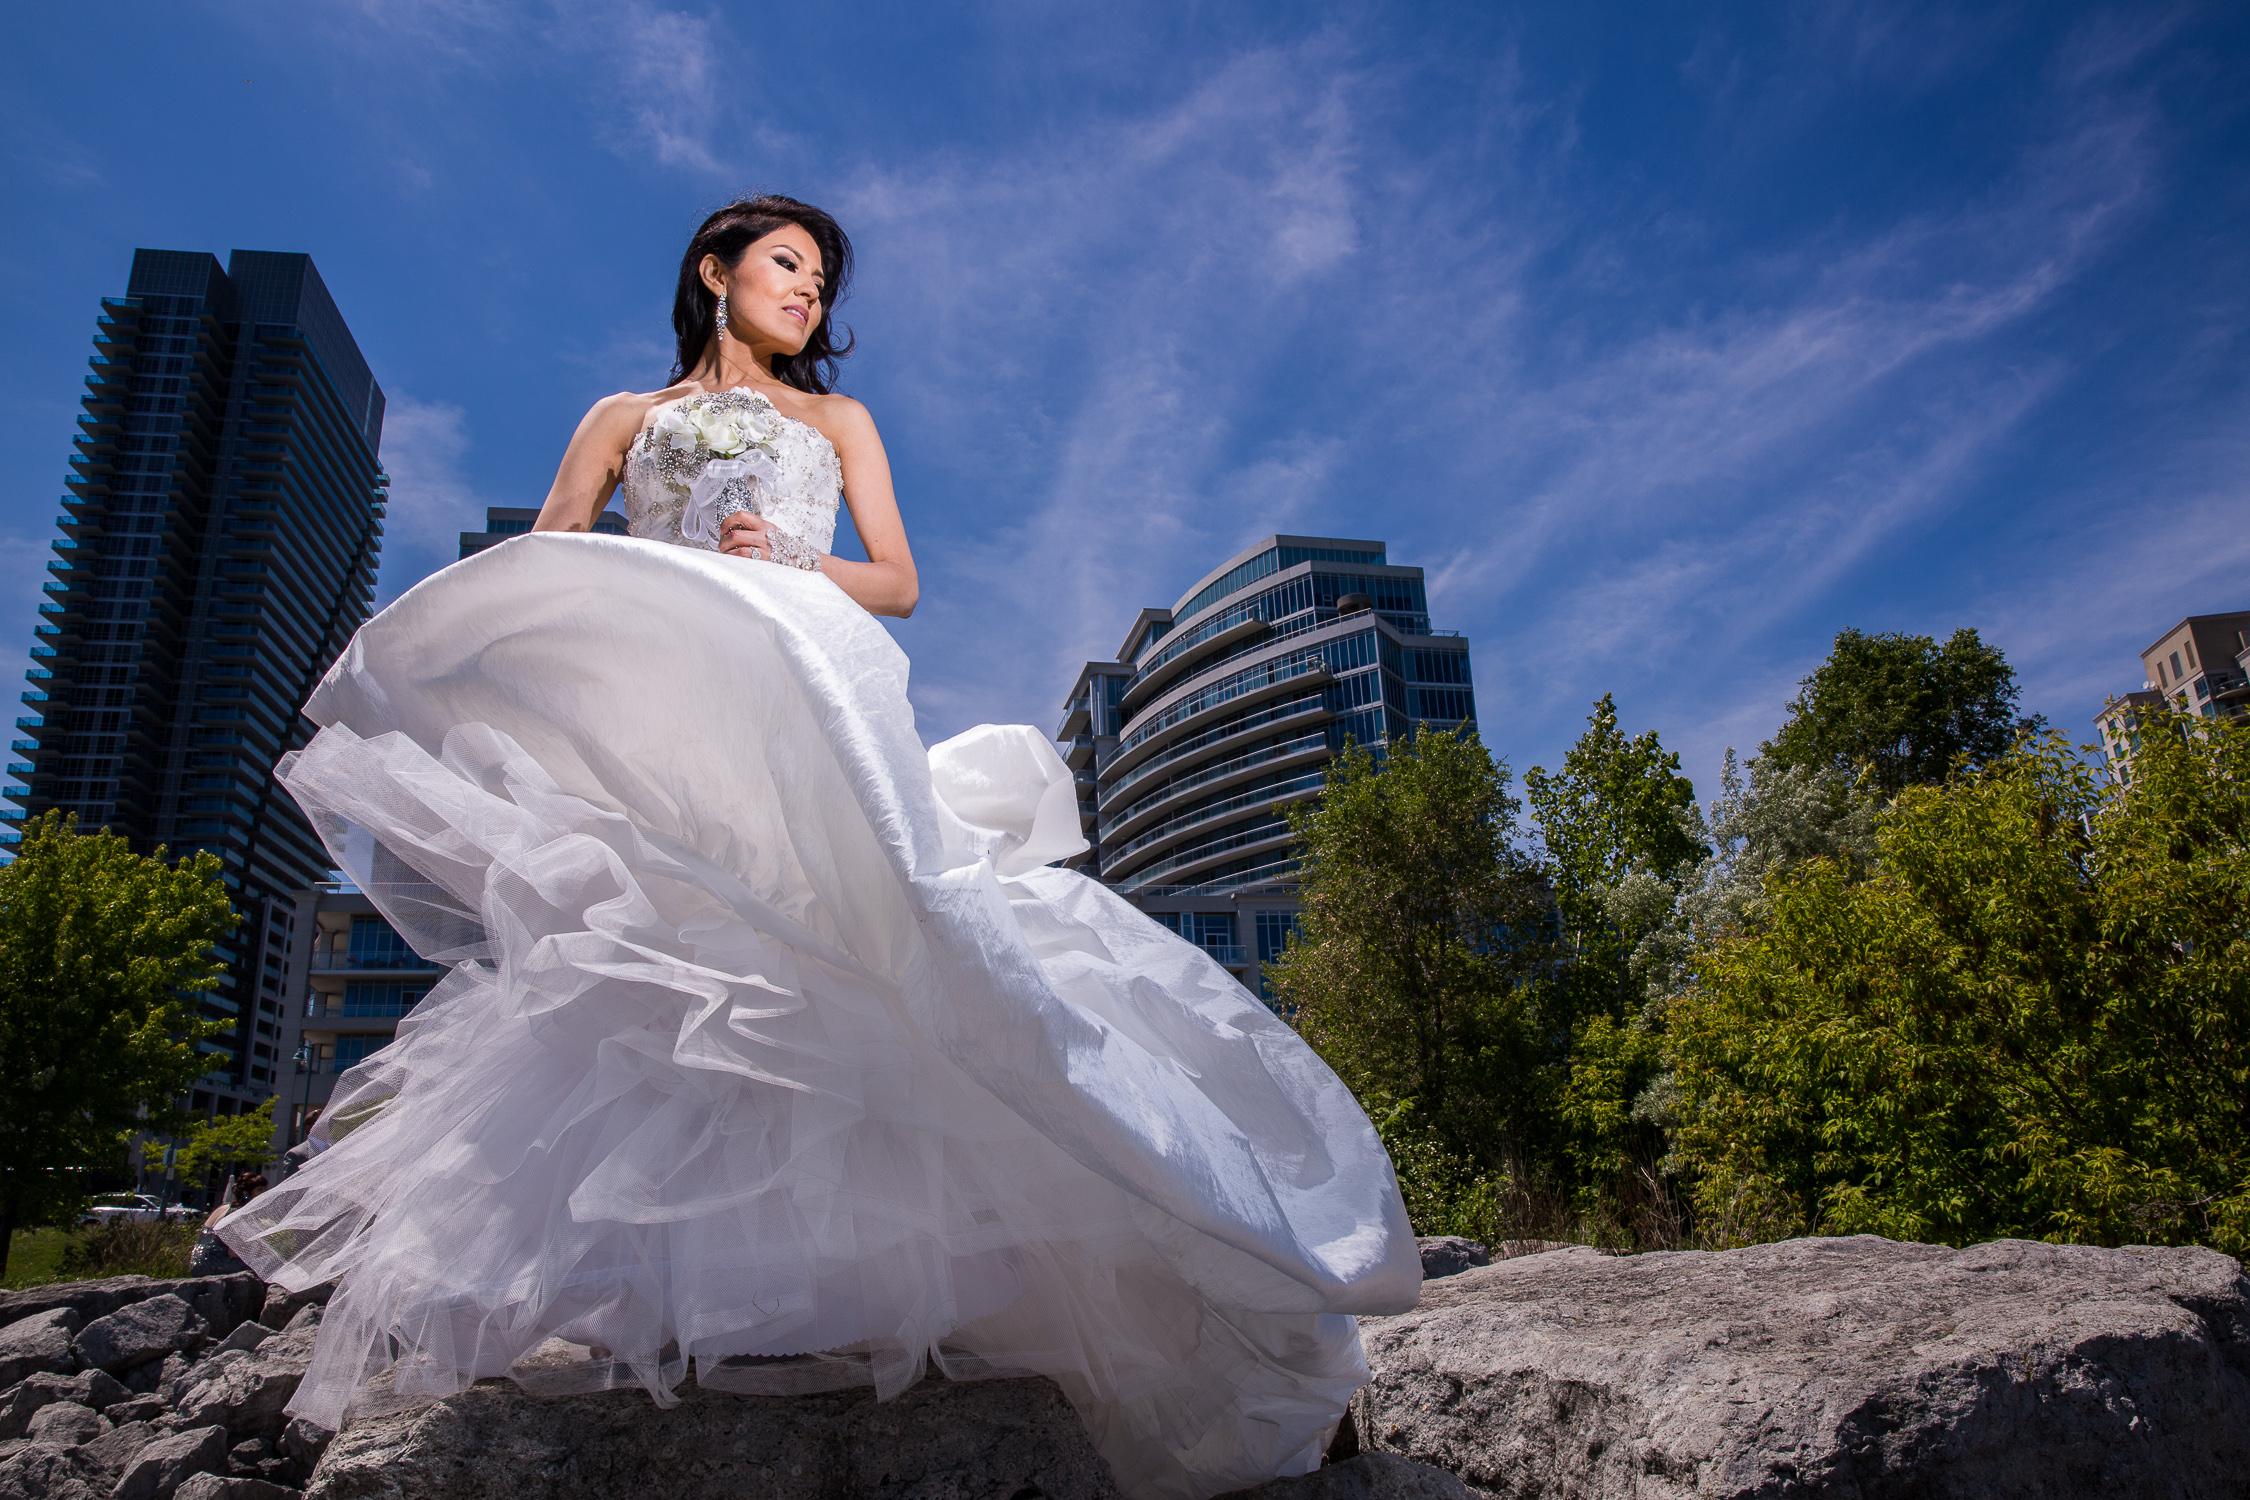 Paradise-Banquet-Hall-Wedding-Vaughan-Ontario-0053.jpg